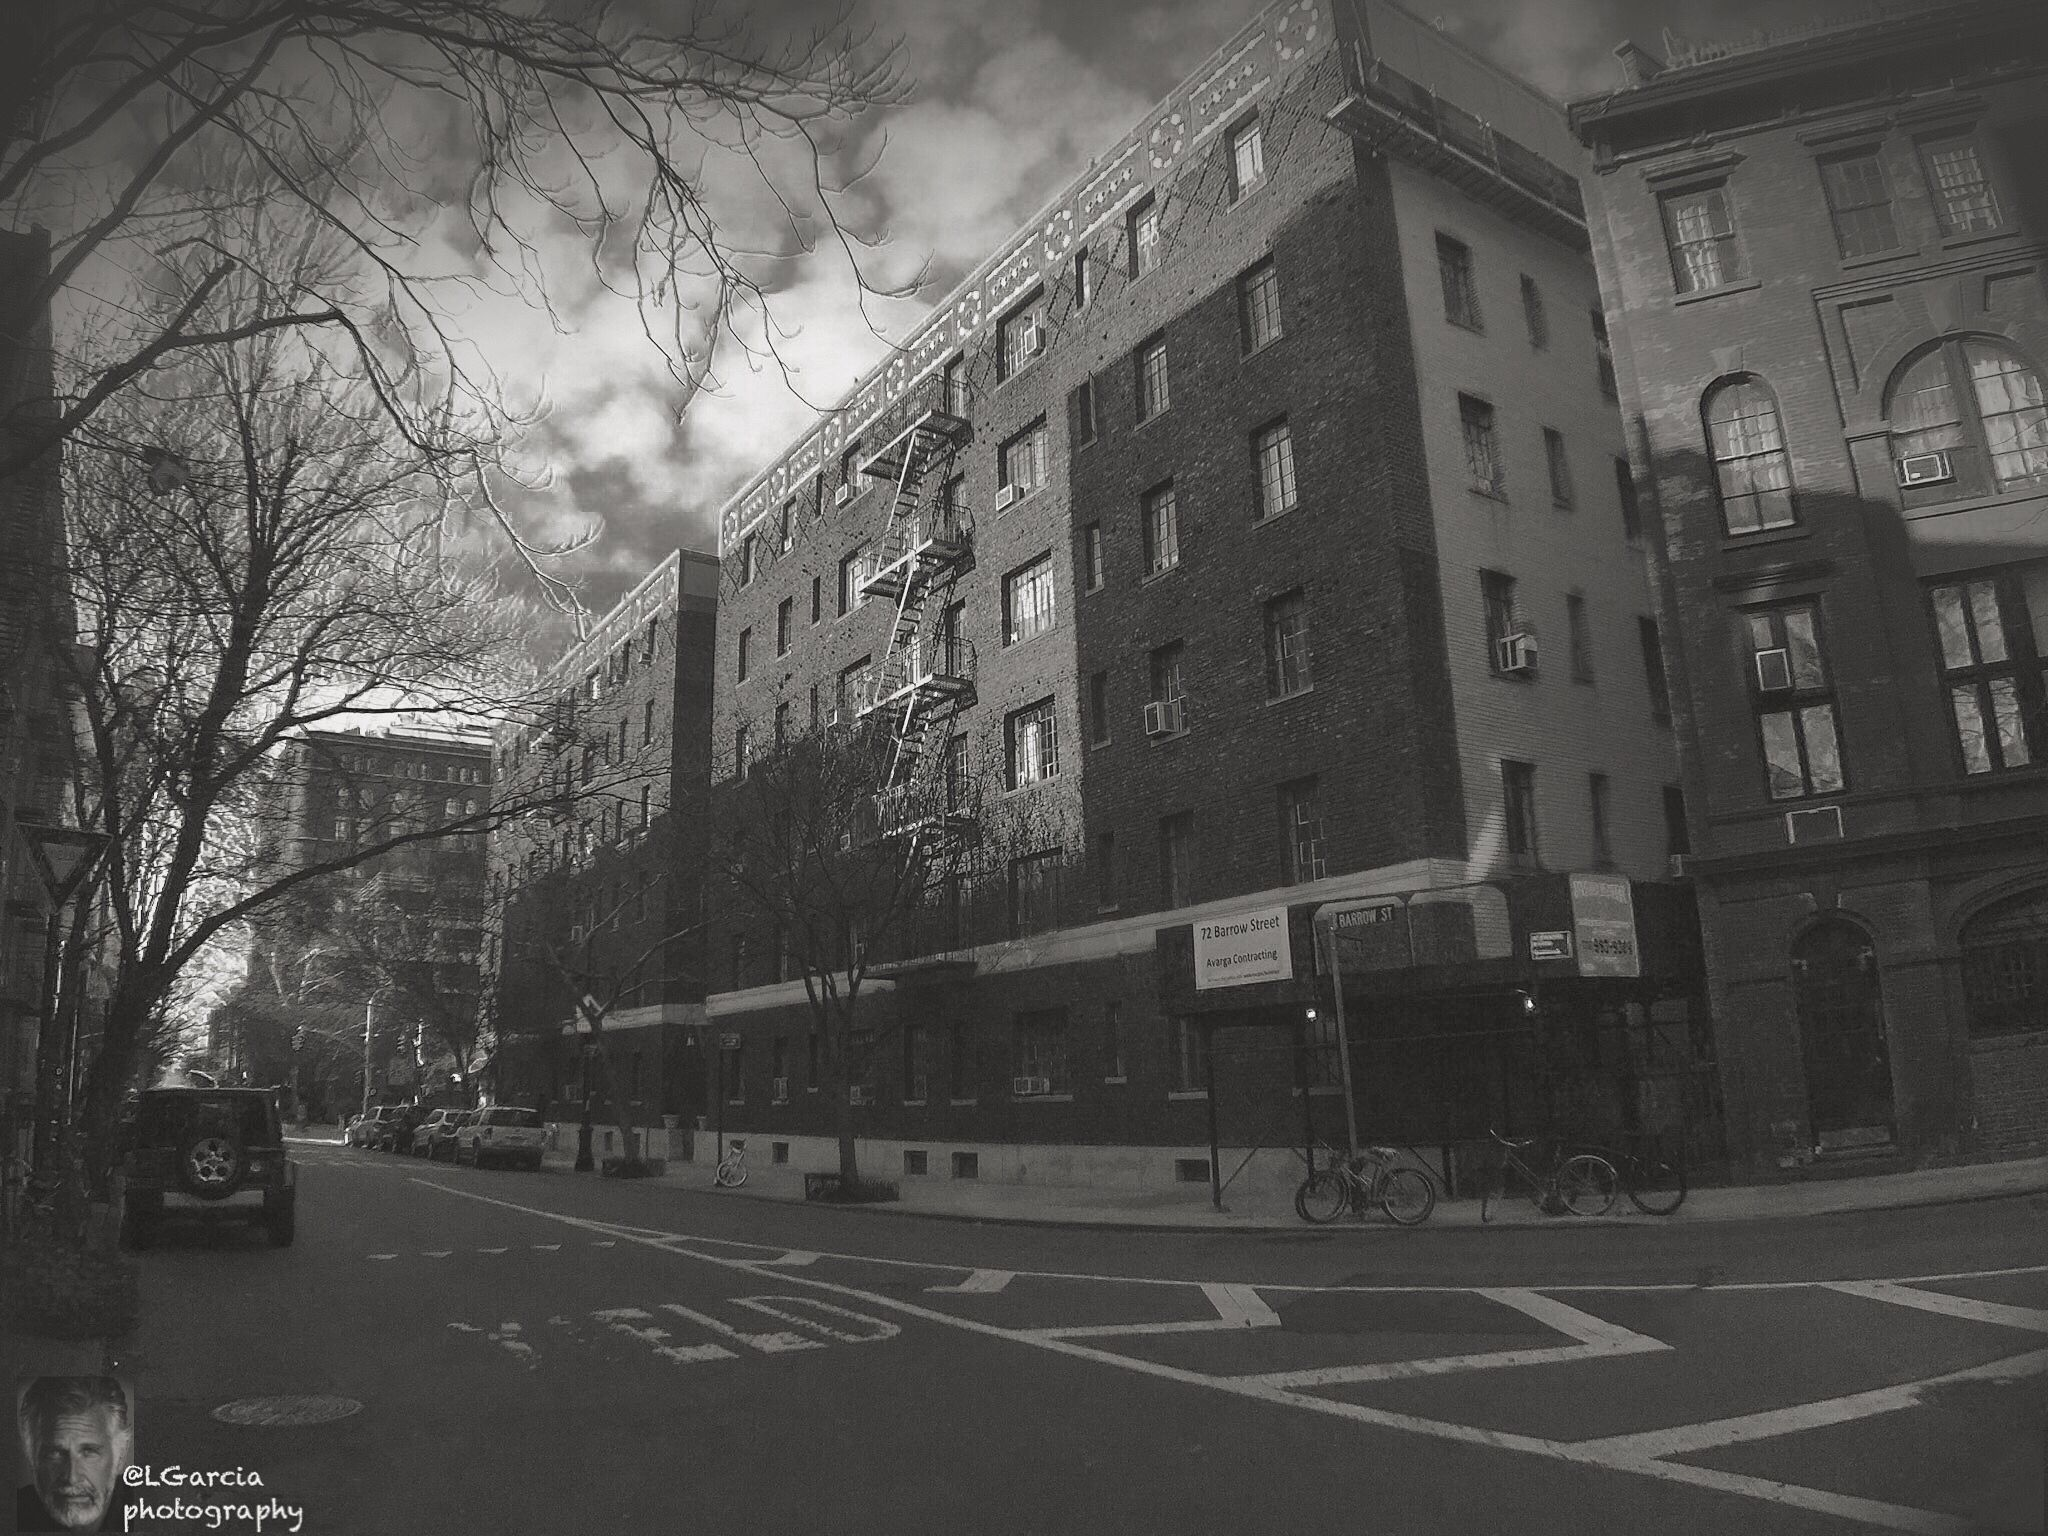 Down the street....... . . . . . . . . #lgarciaphotography #iphone6plus #iphoneBNW #iphone #building #nyc #nycinstagram #nycphotography #newyork #newyorkcity #newyork_instagram #monochrome #nypix #blackandwhite #blackandwhitephotography #architecture #architecturephoto #bridge #dark #street #streetphoto #streetphoto_bw #streetphotography #noir #shadow #urban #city #bnw #bnw_life #bnw_life